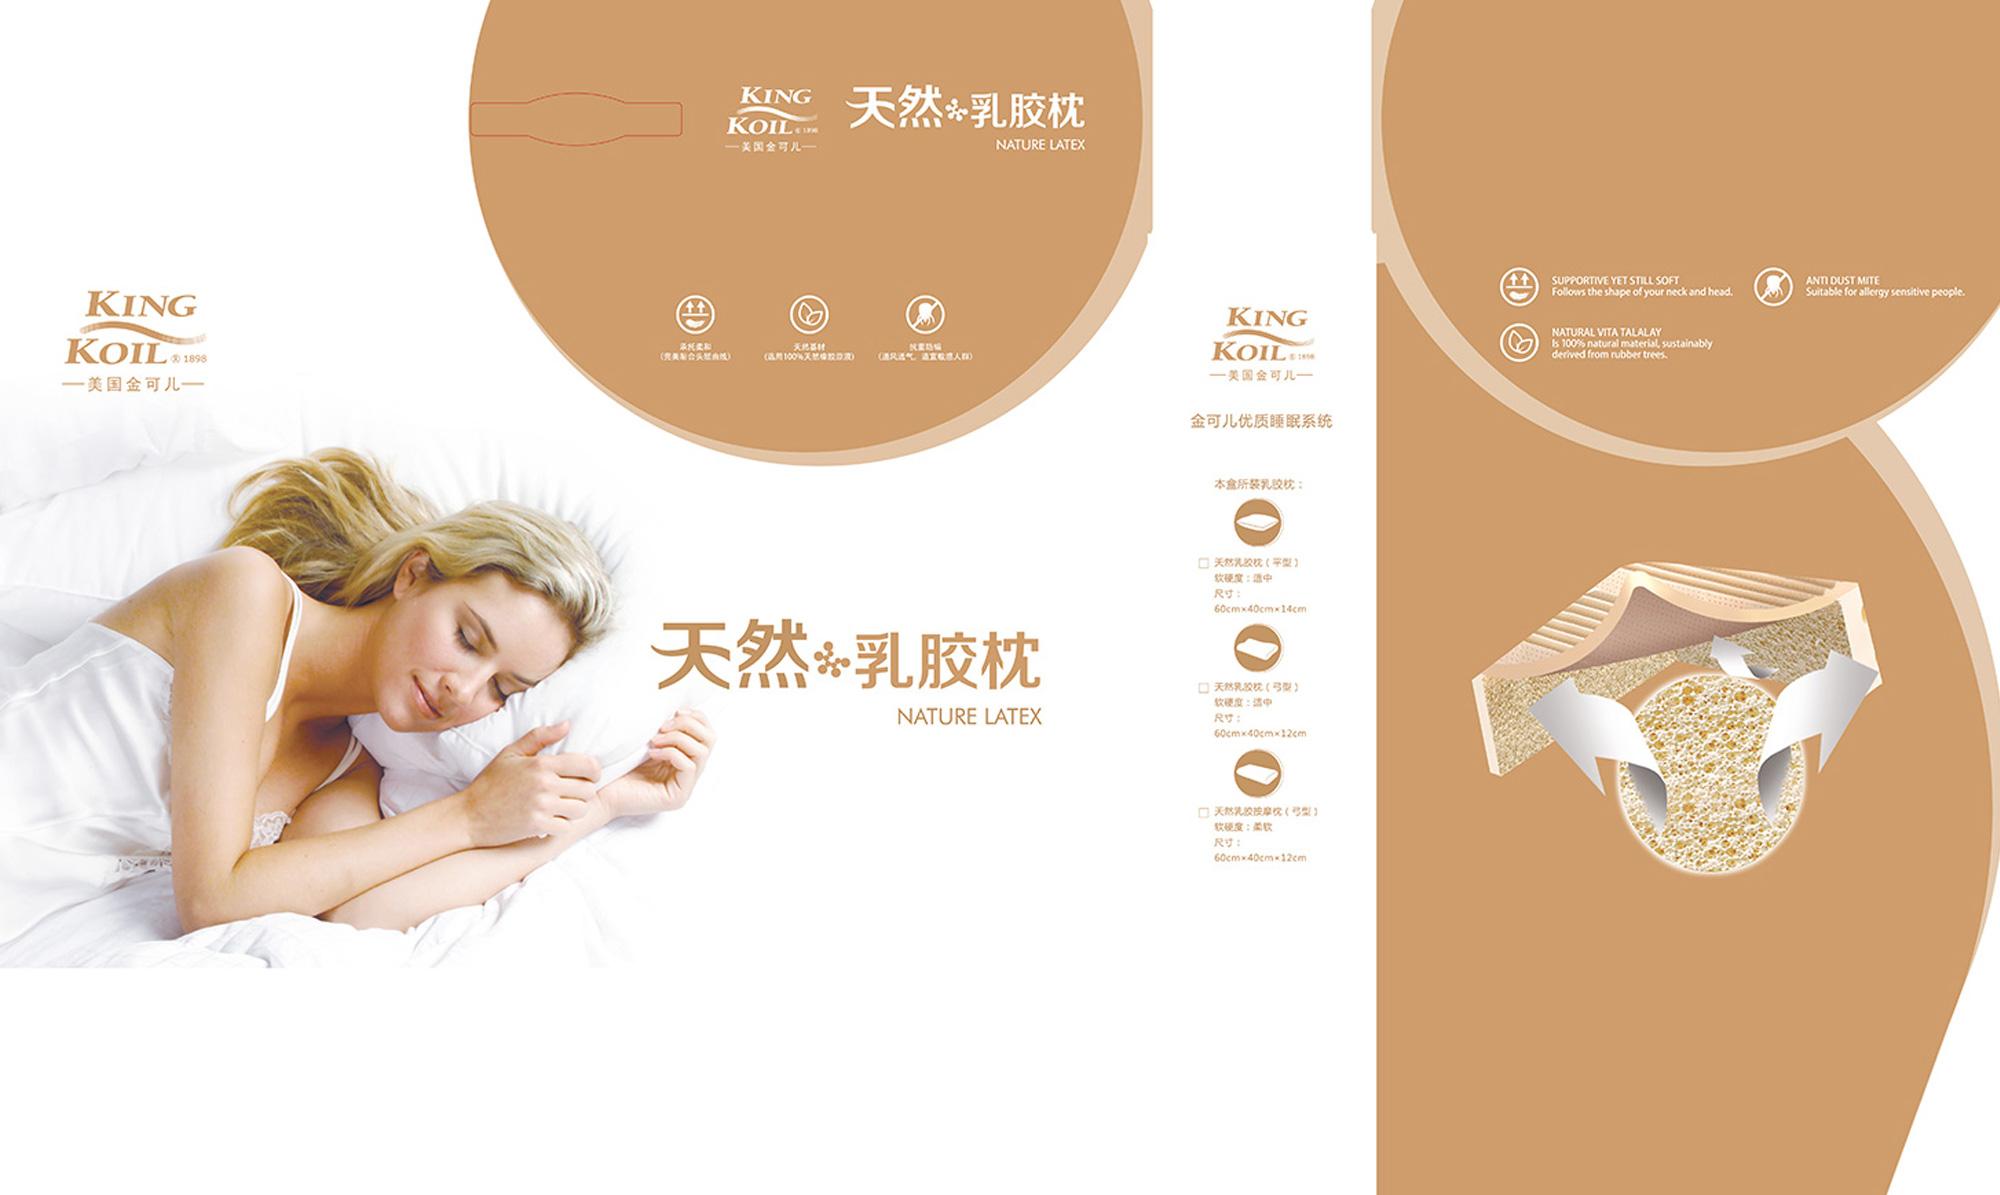 quentin_paquignon-packaging-kingkoilchina_06.jpg